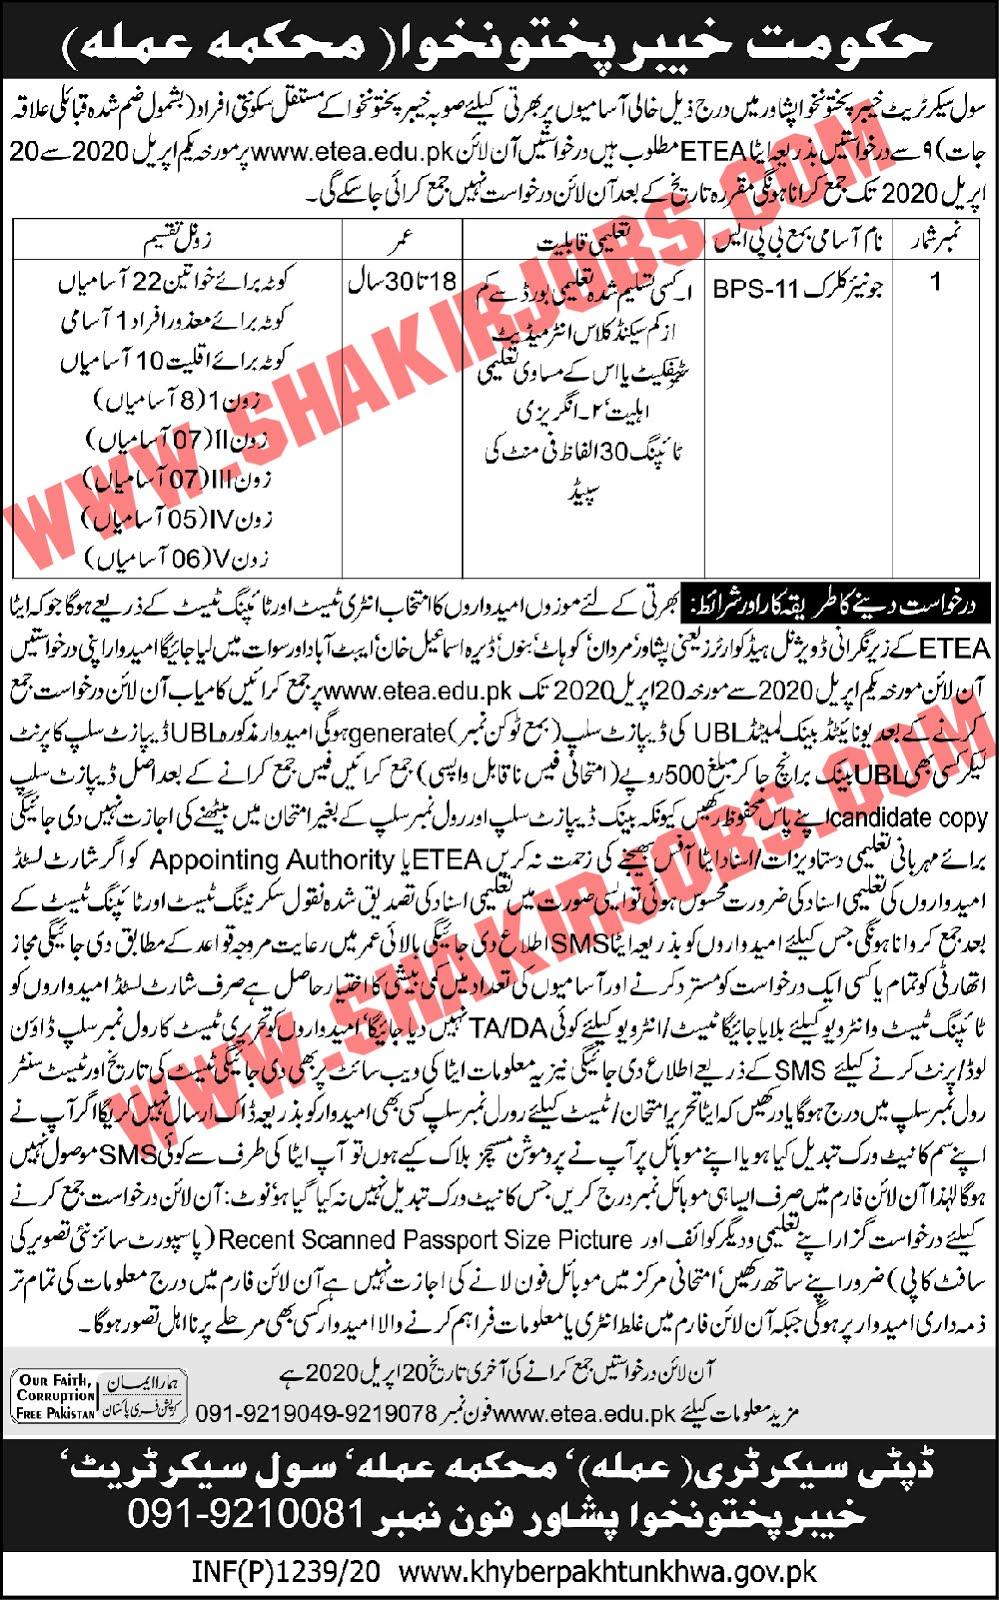 Civil Secretariat Khyber Pakhtunkhwa Jobs April 2020 Online Apply